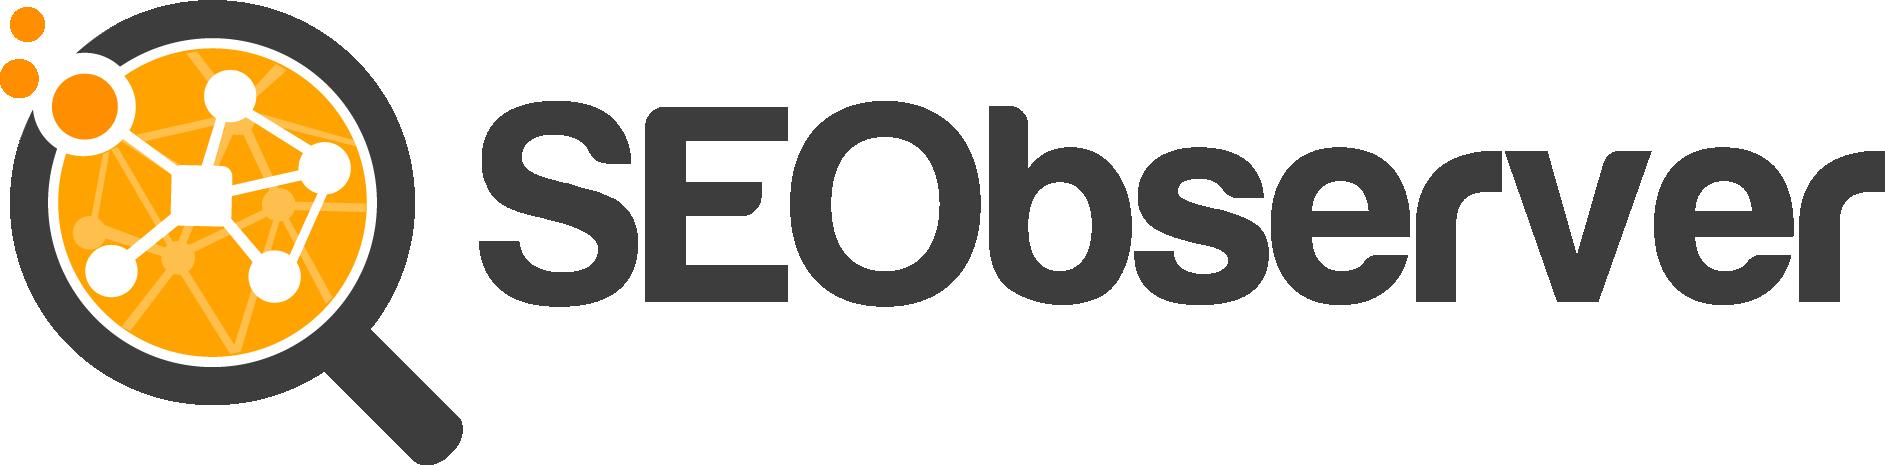 seobserver_logo